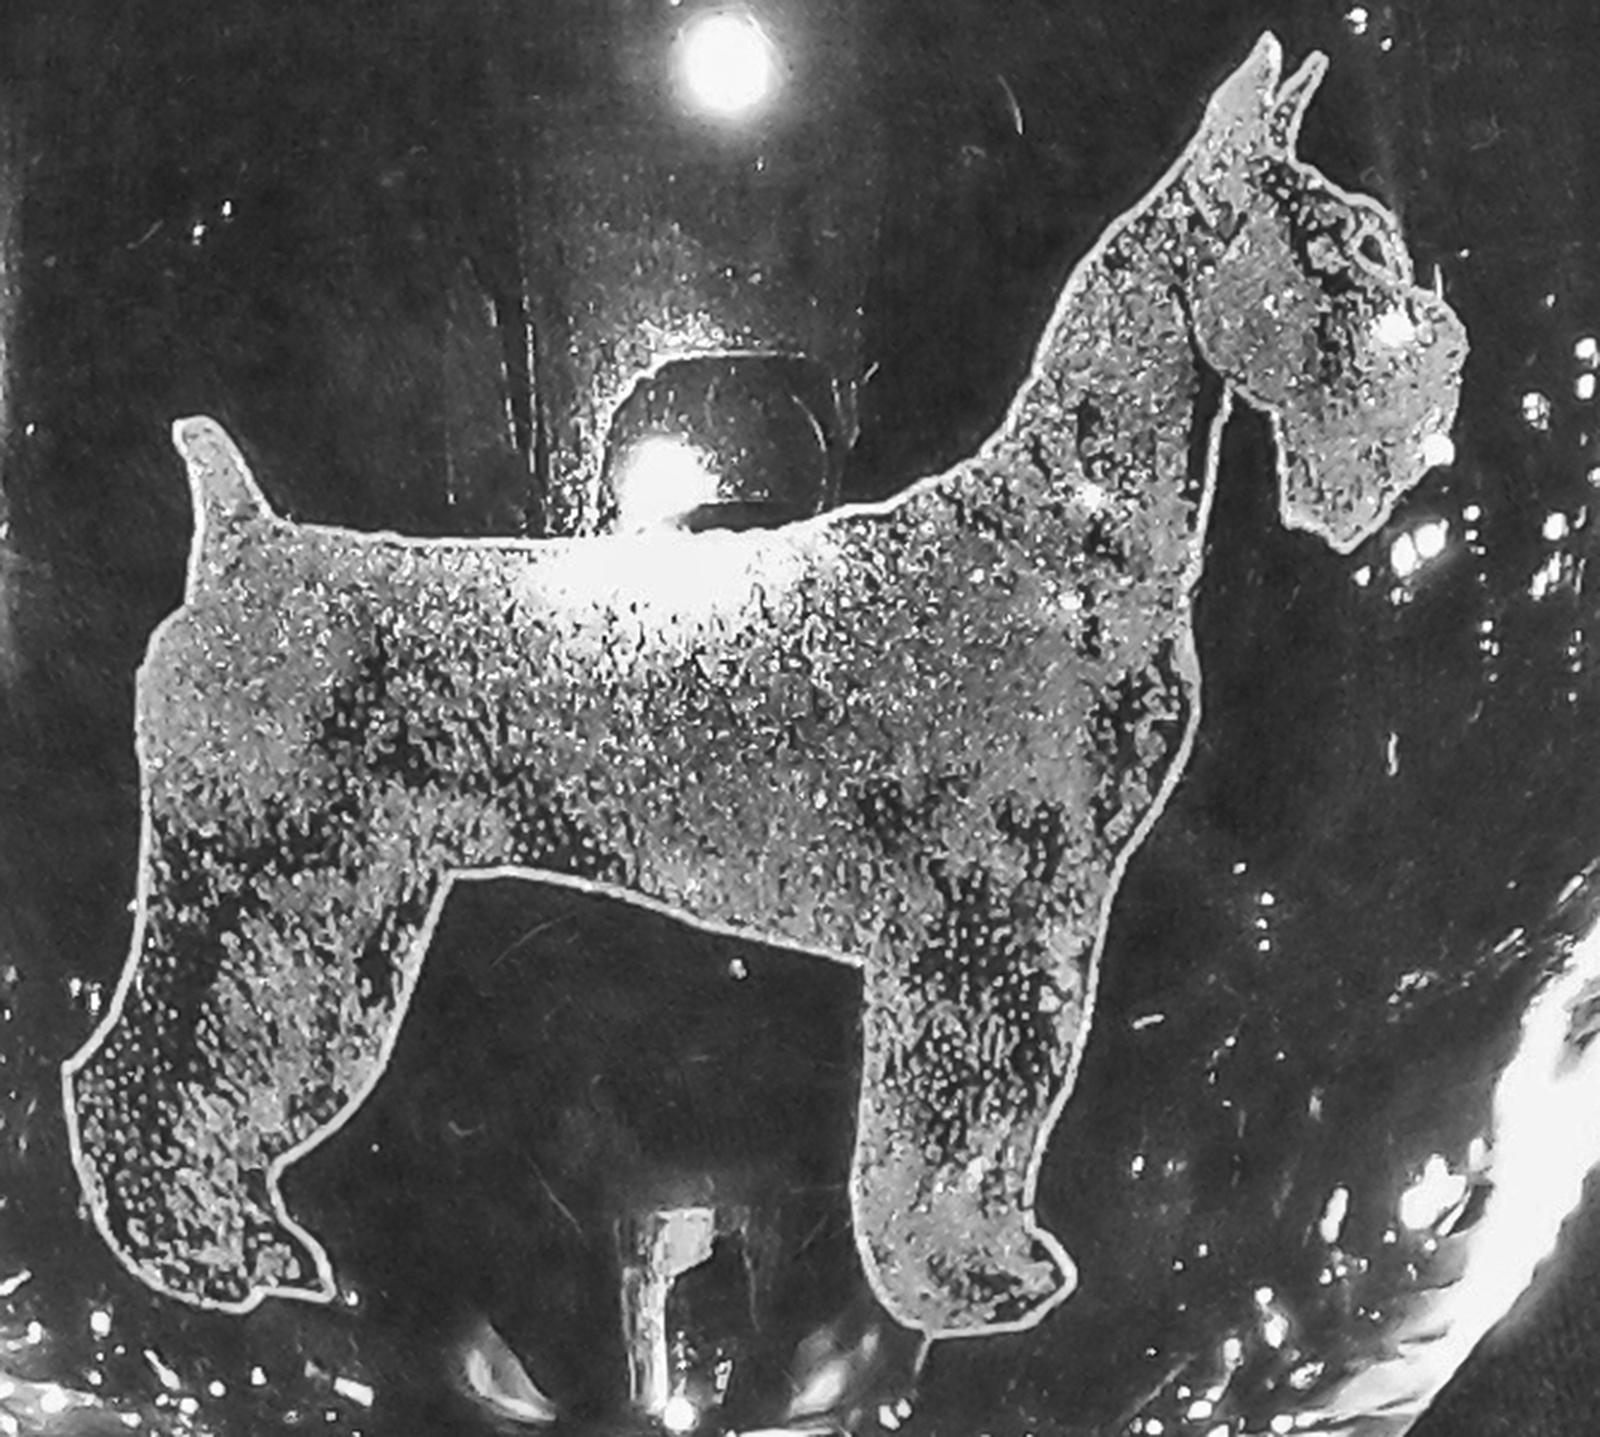 Giant Schnauzer Dog Muddy Creek Reflections